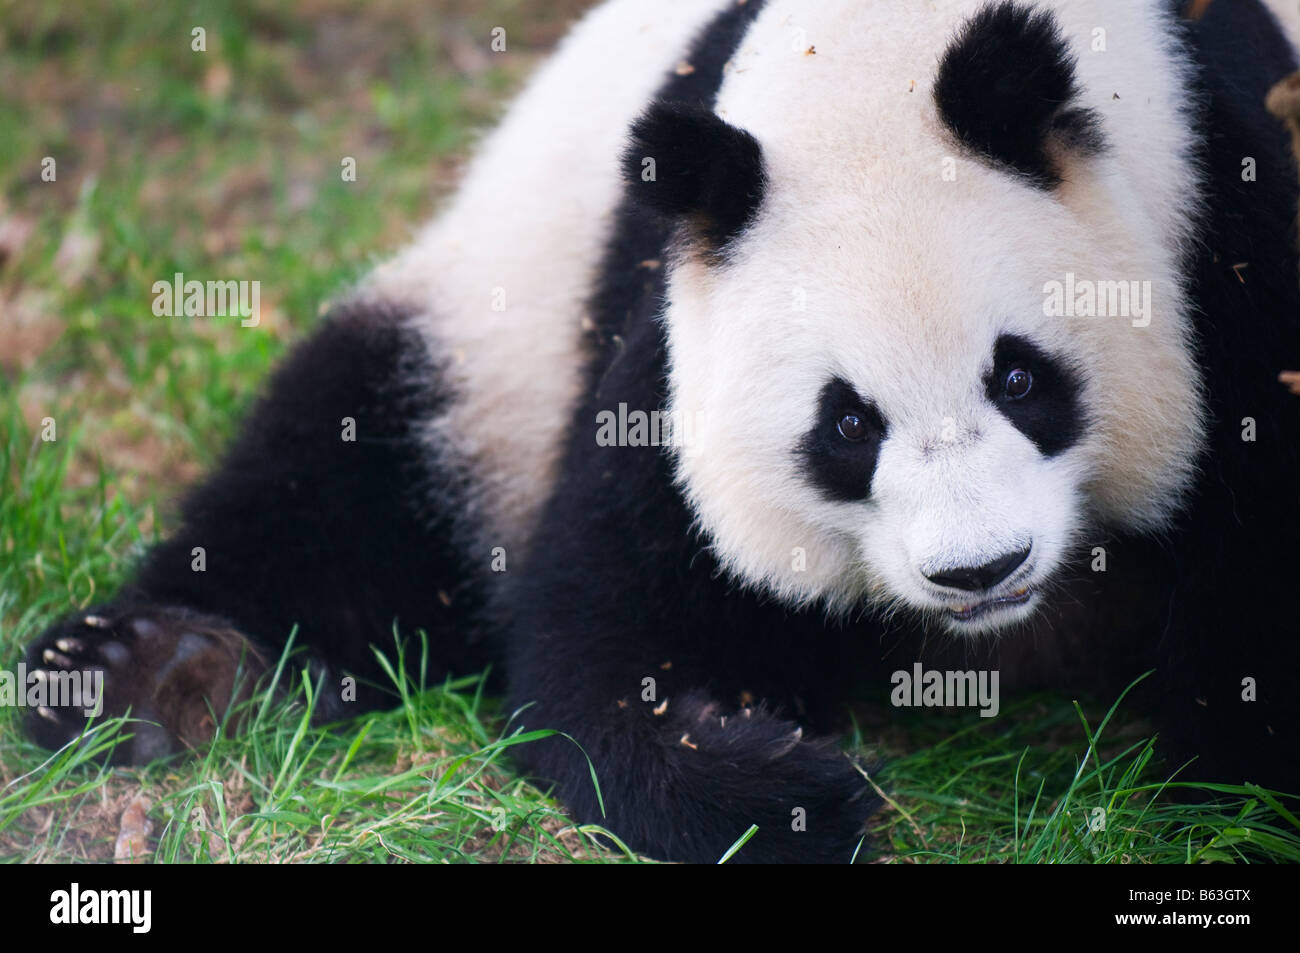 China Sichuan Panda Reserve Unesco World Heritage site - Stock Image